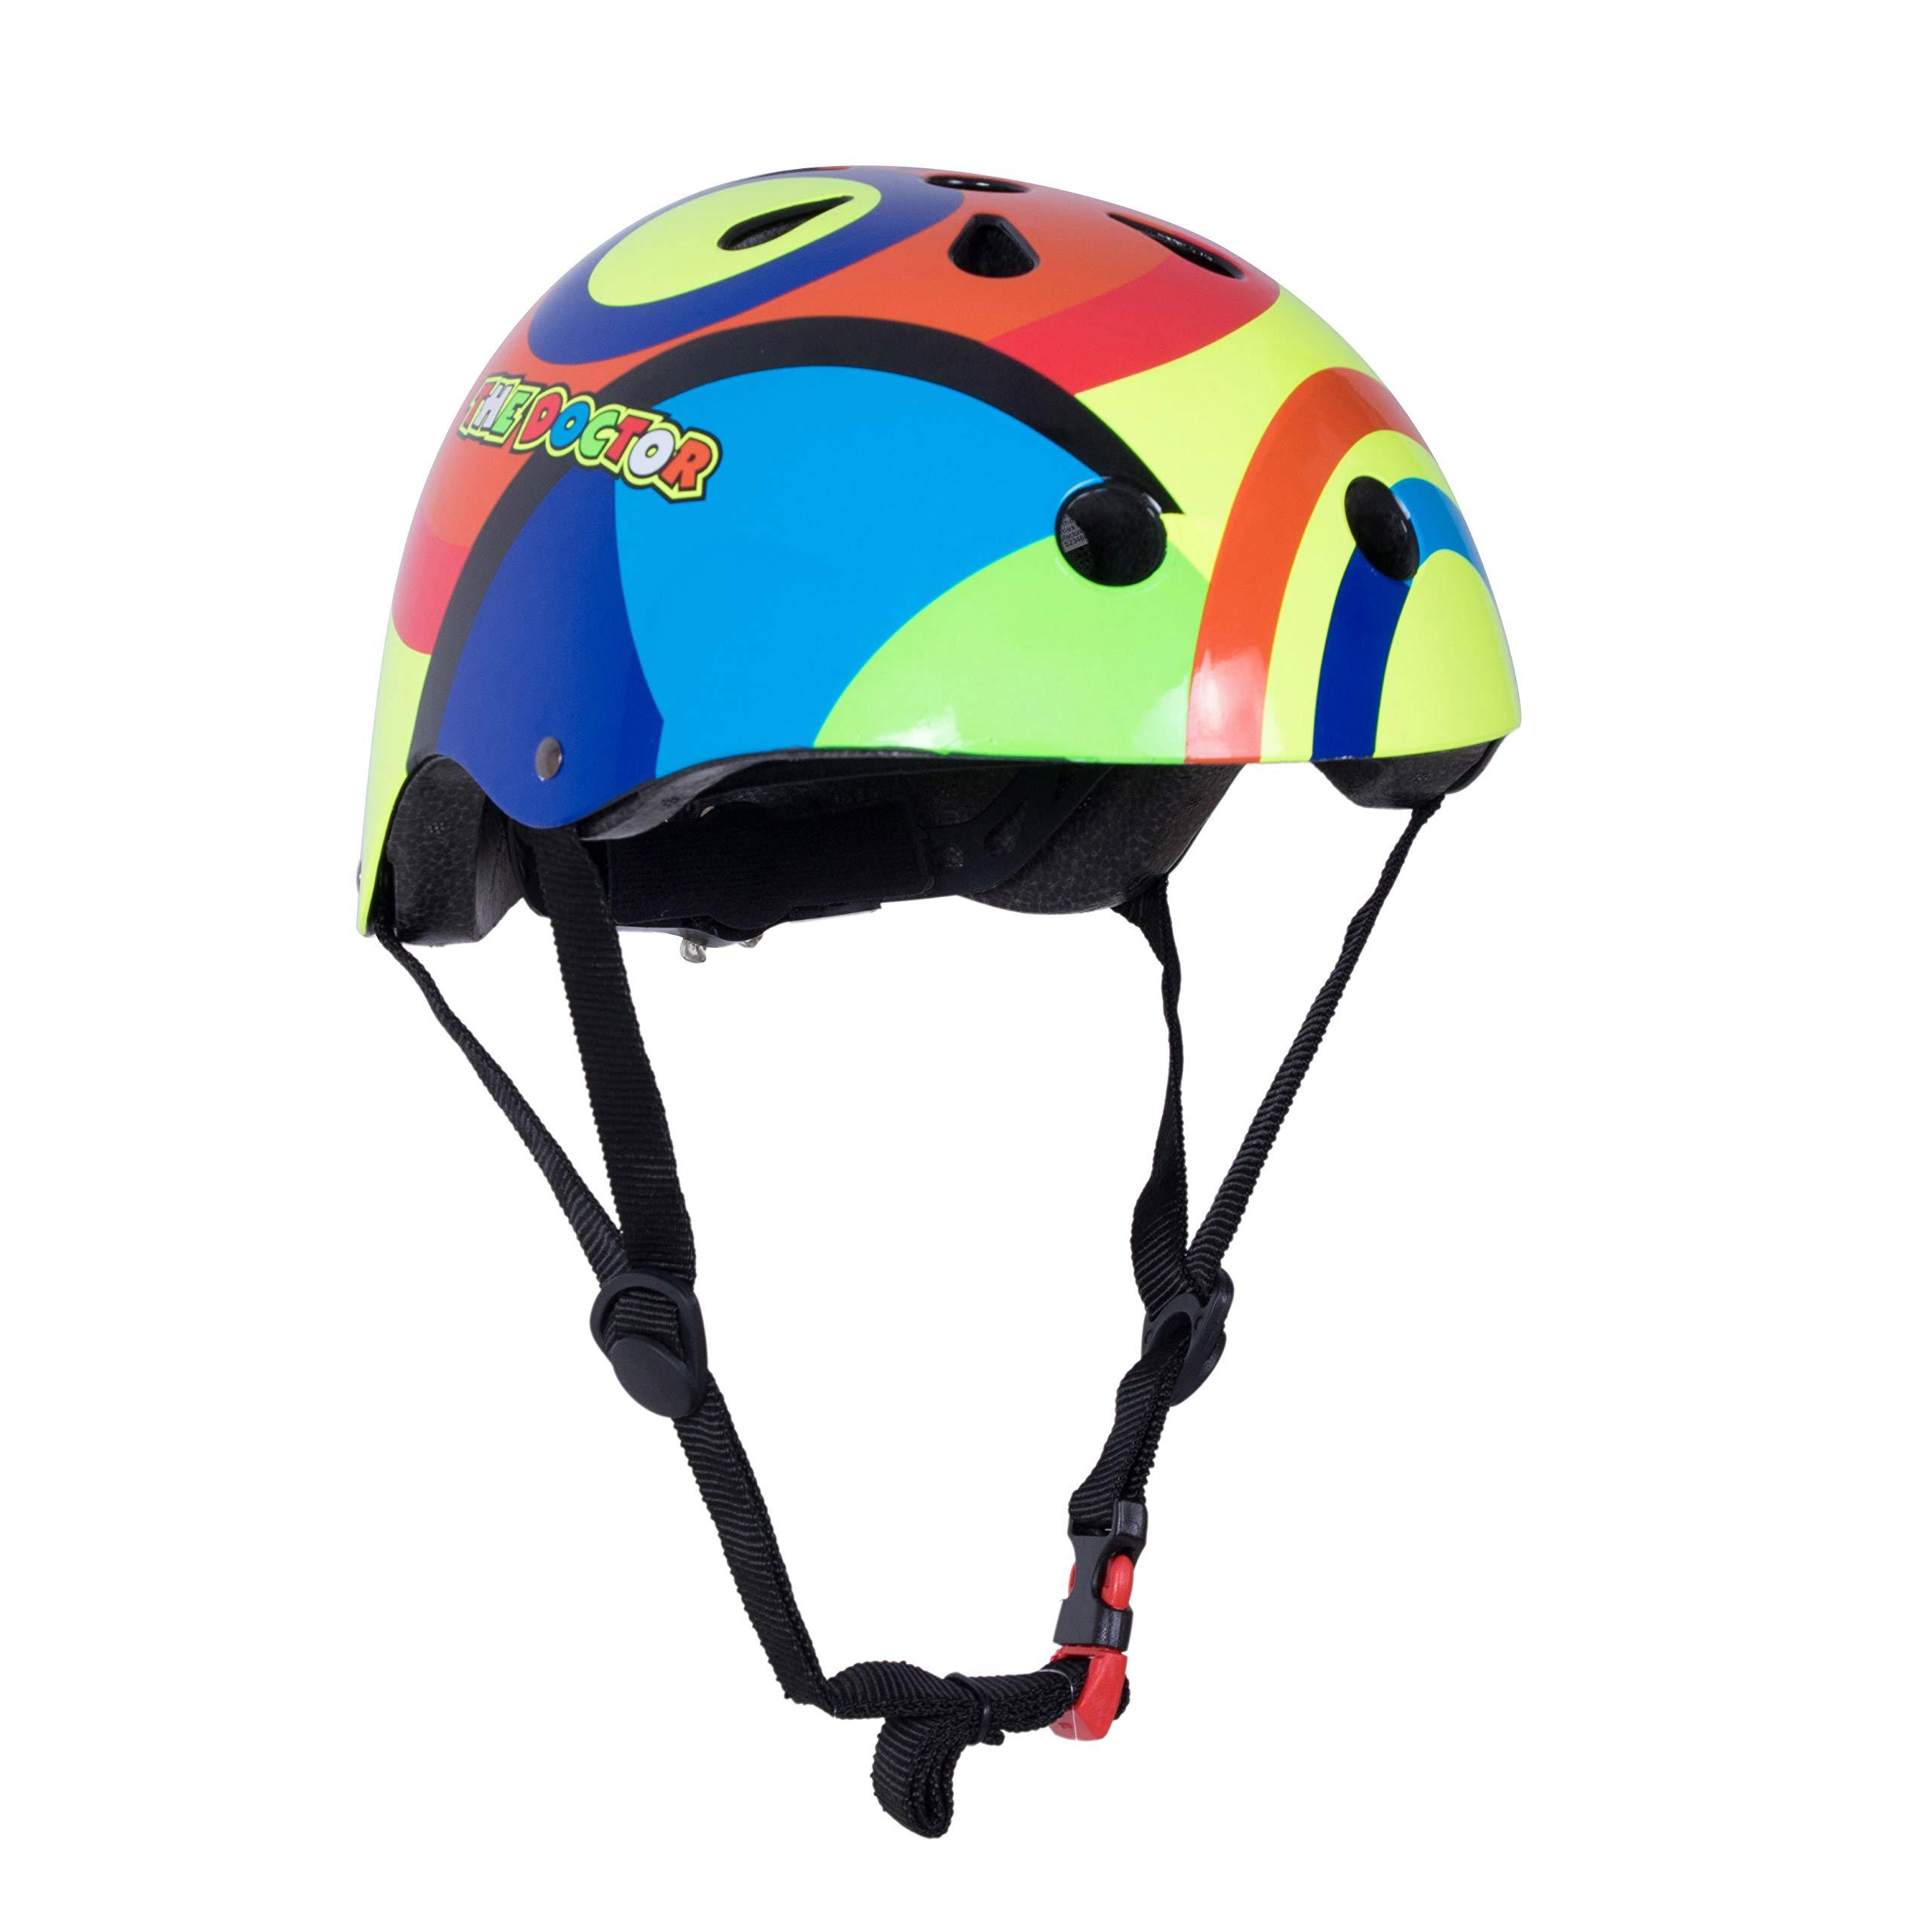 Kiddimoto Valentino Rossi Helmet, Small (48-53 cm)